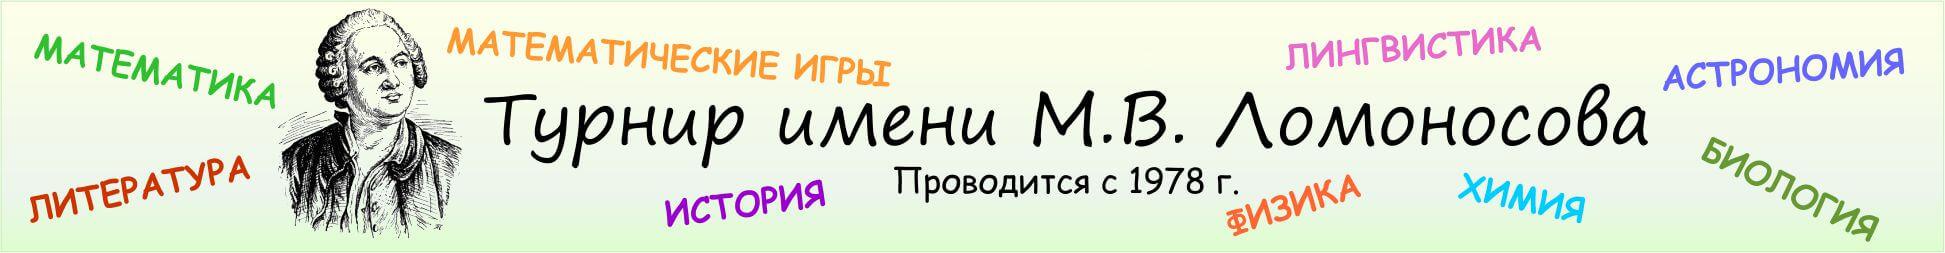 40-й турнир имени Ломоносова